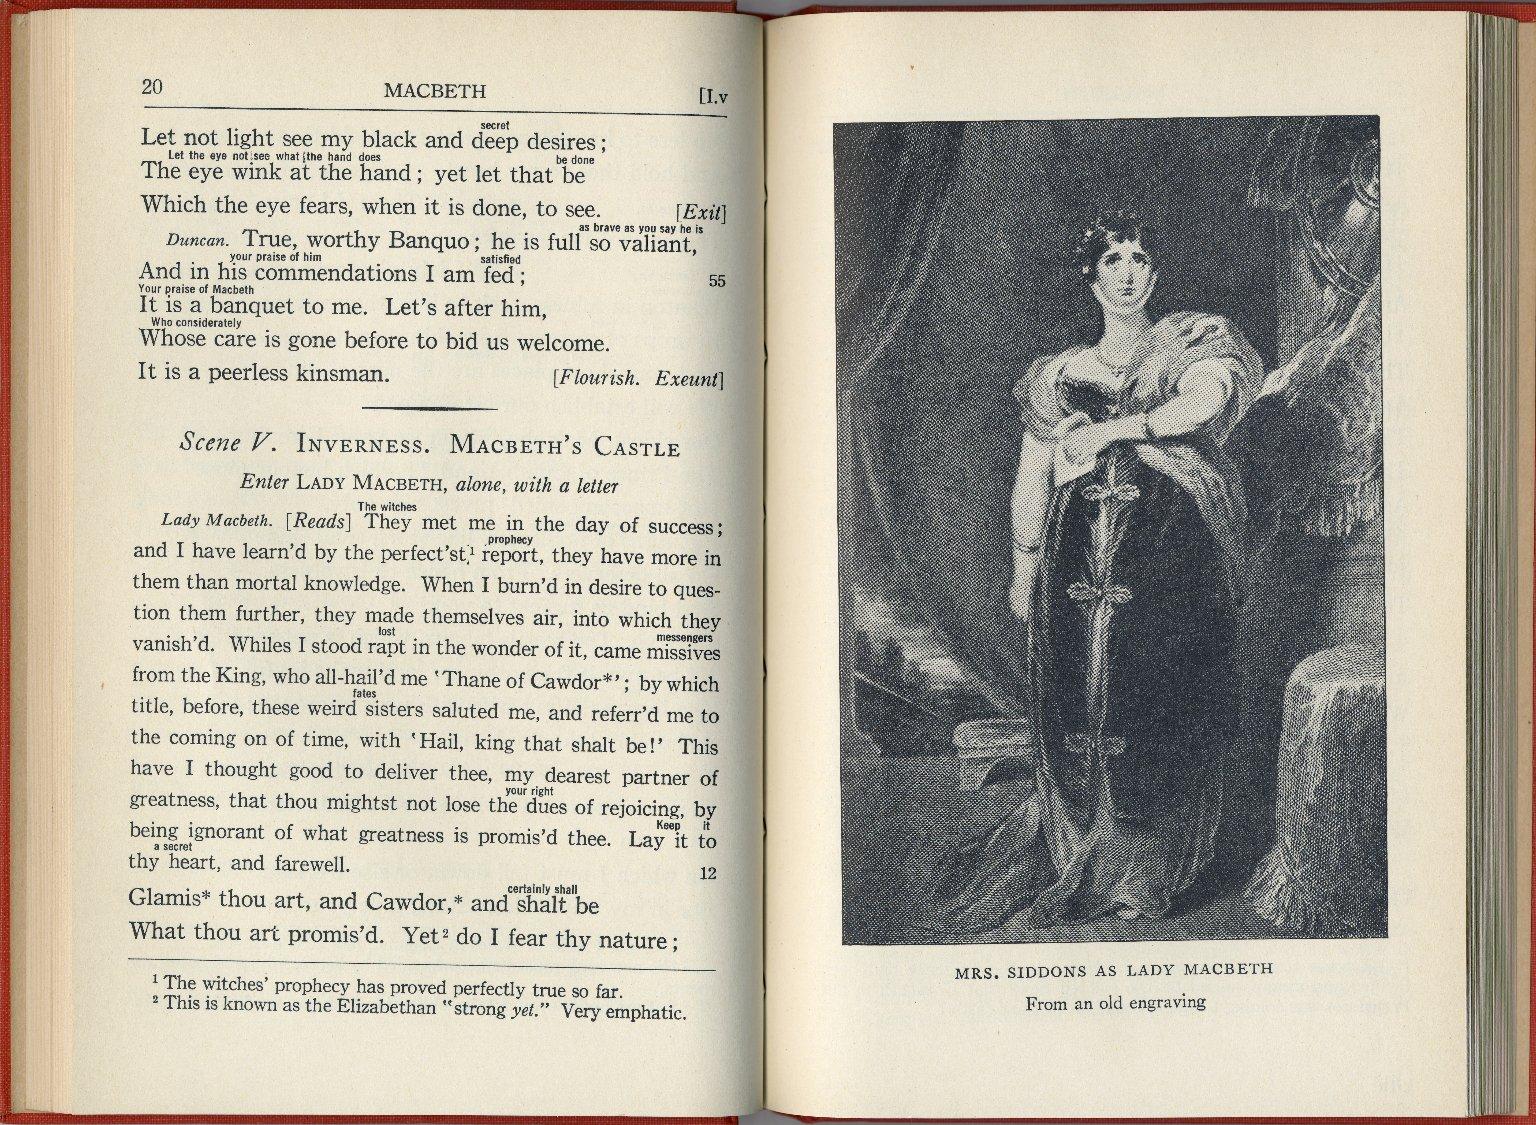 Shakespeare's Macbeth Interlinear edition